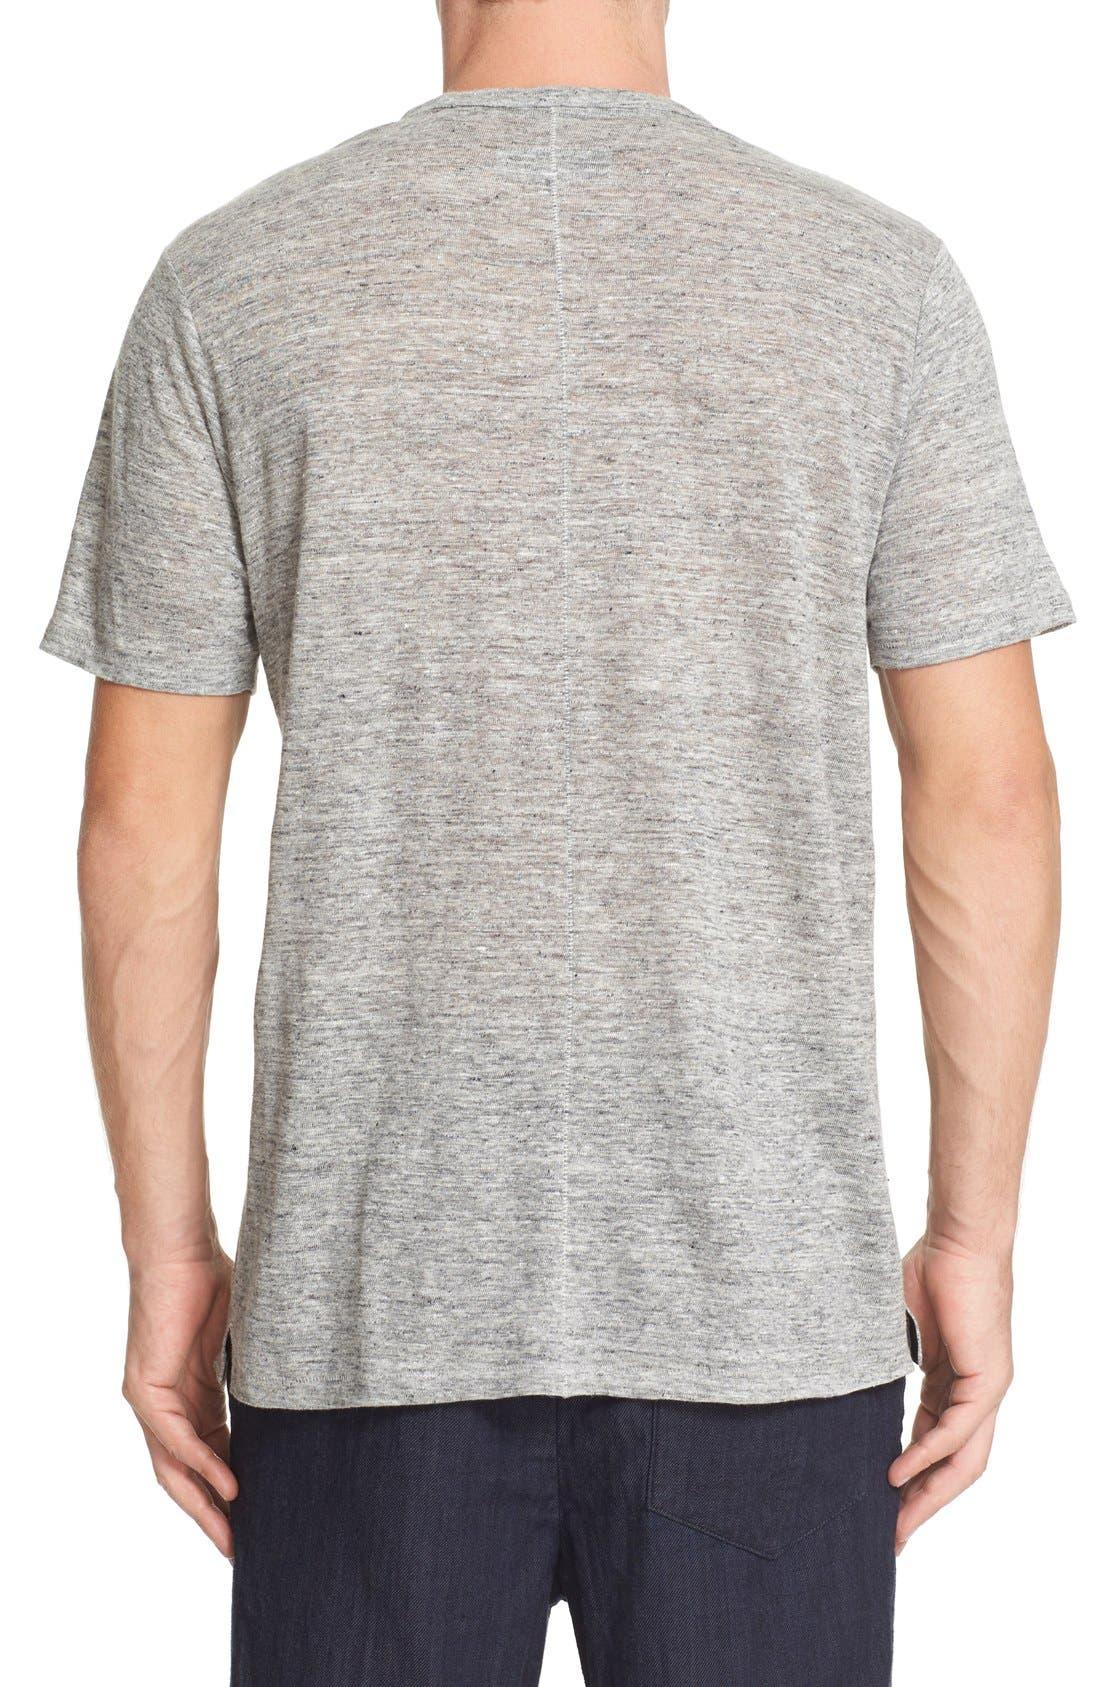 Owen Slub Linen T-Shirt,                             Alternate thumbnail 2, color,                             020